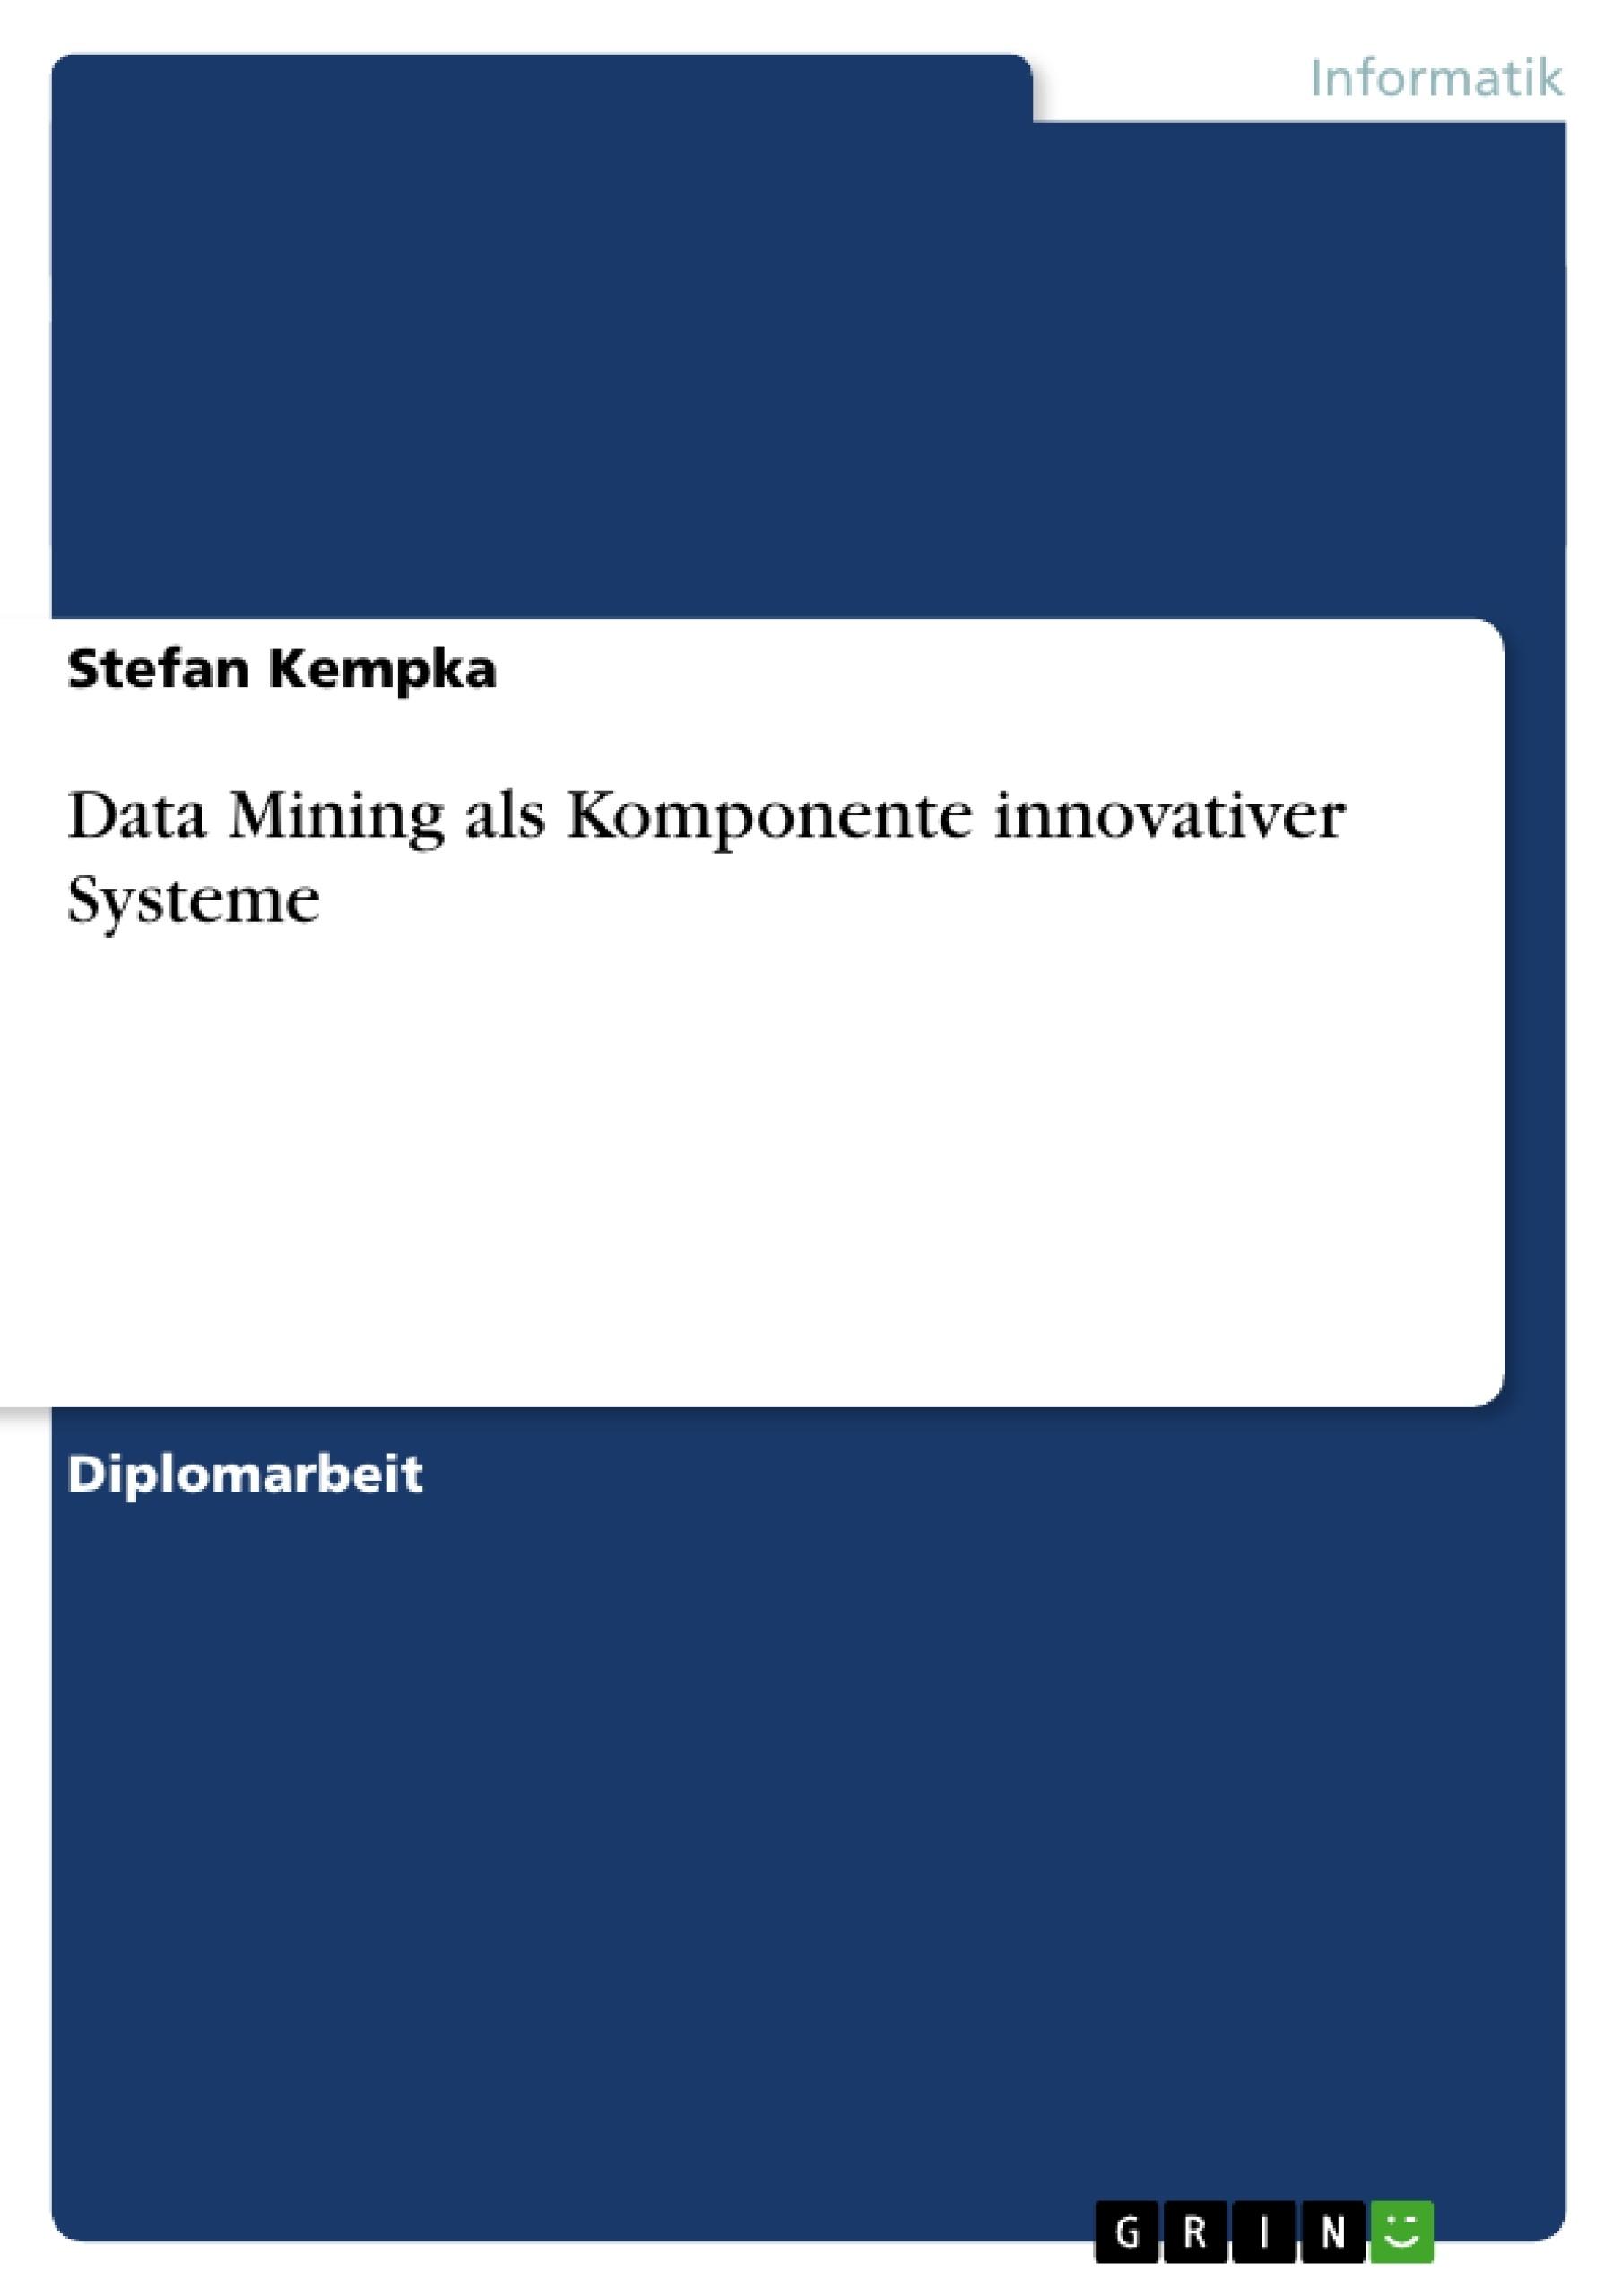 Titel: Data Mining als Komponente innovativer Systeme